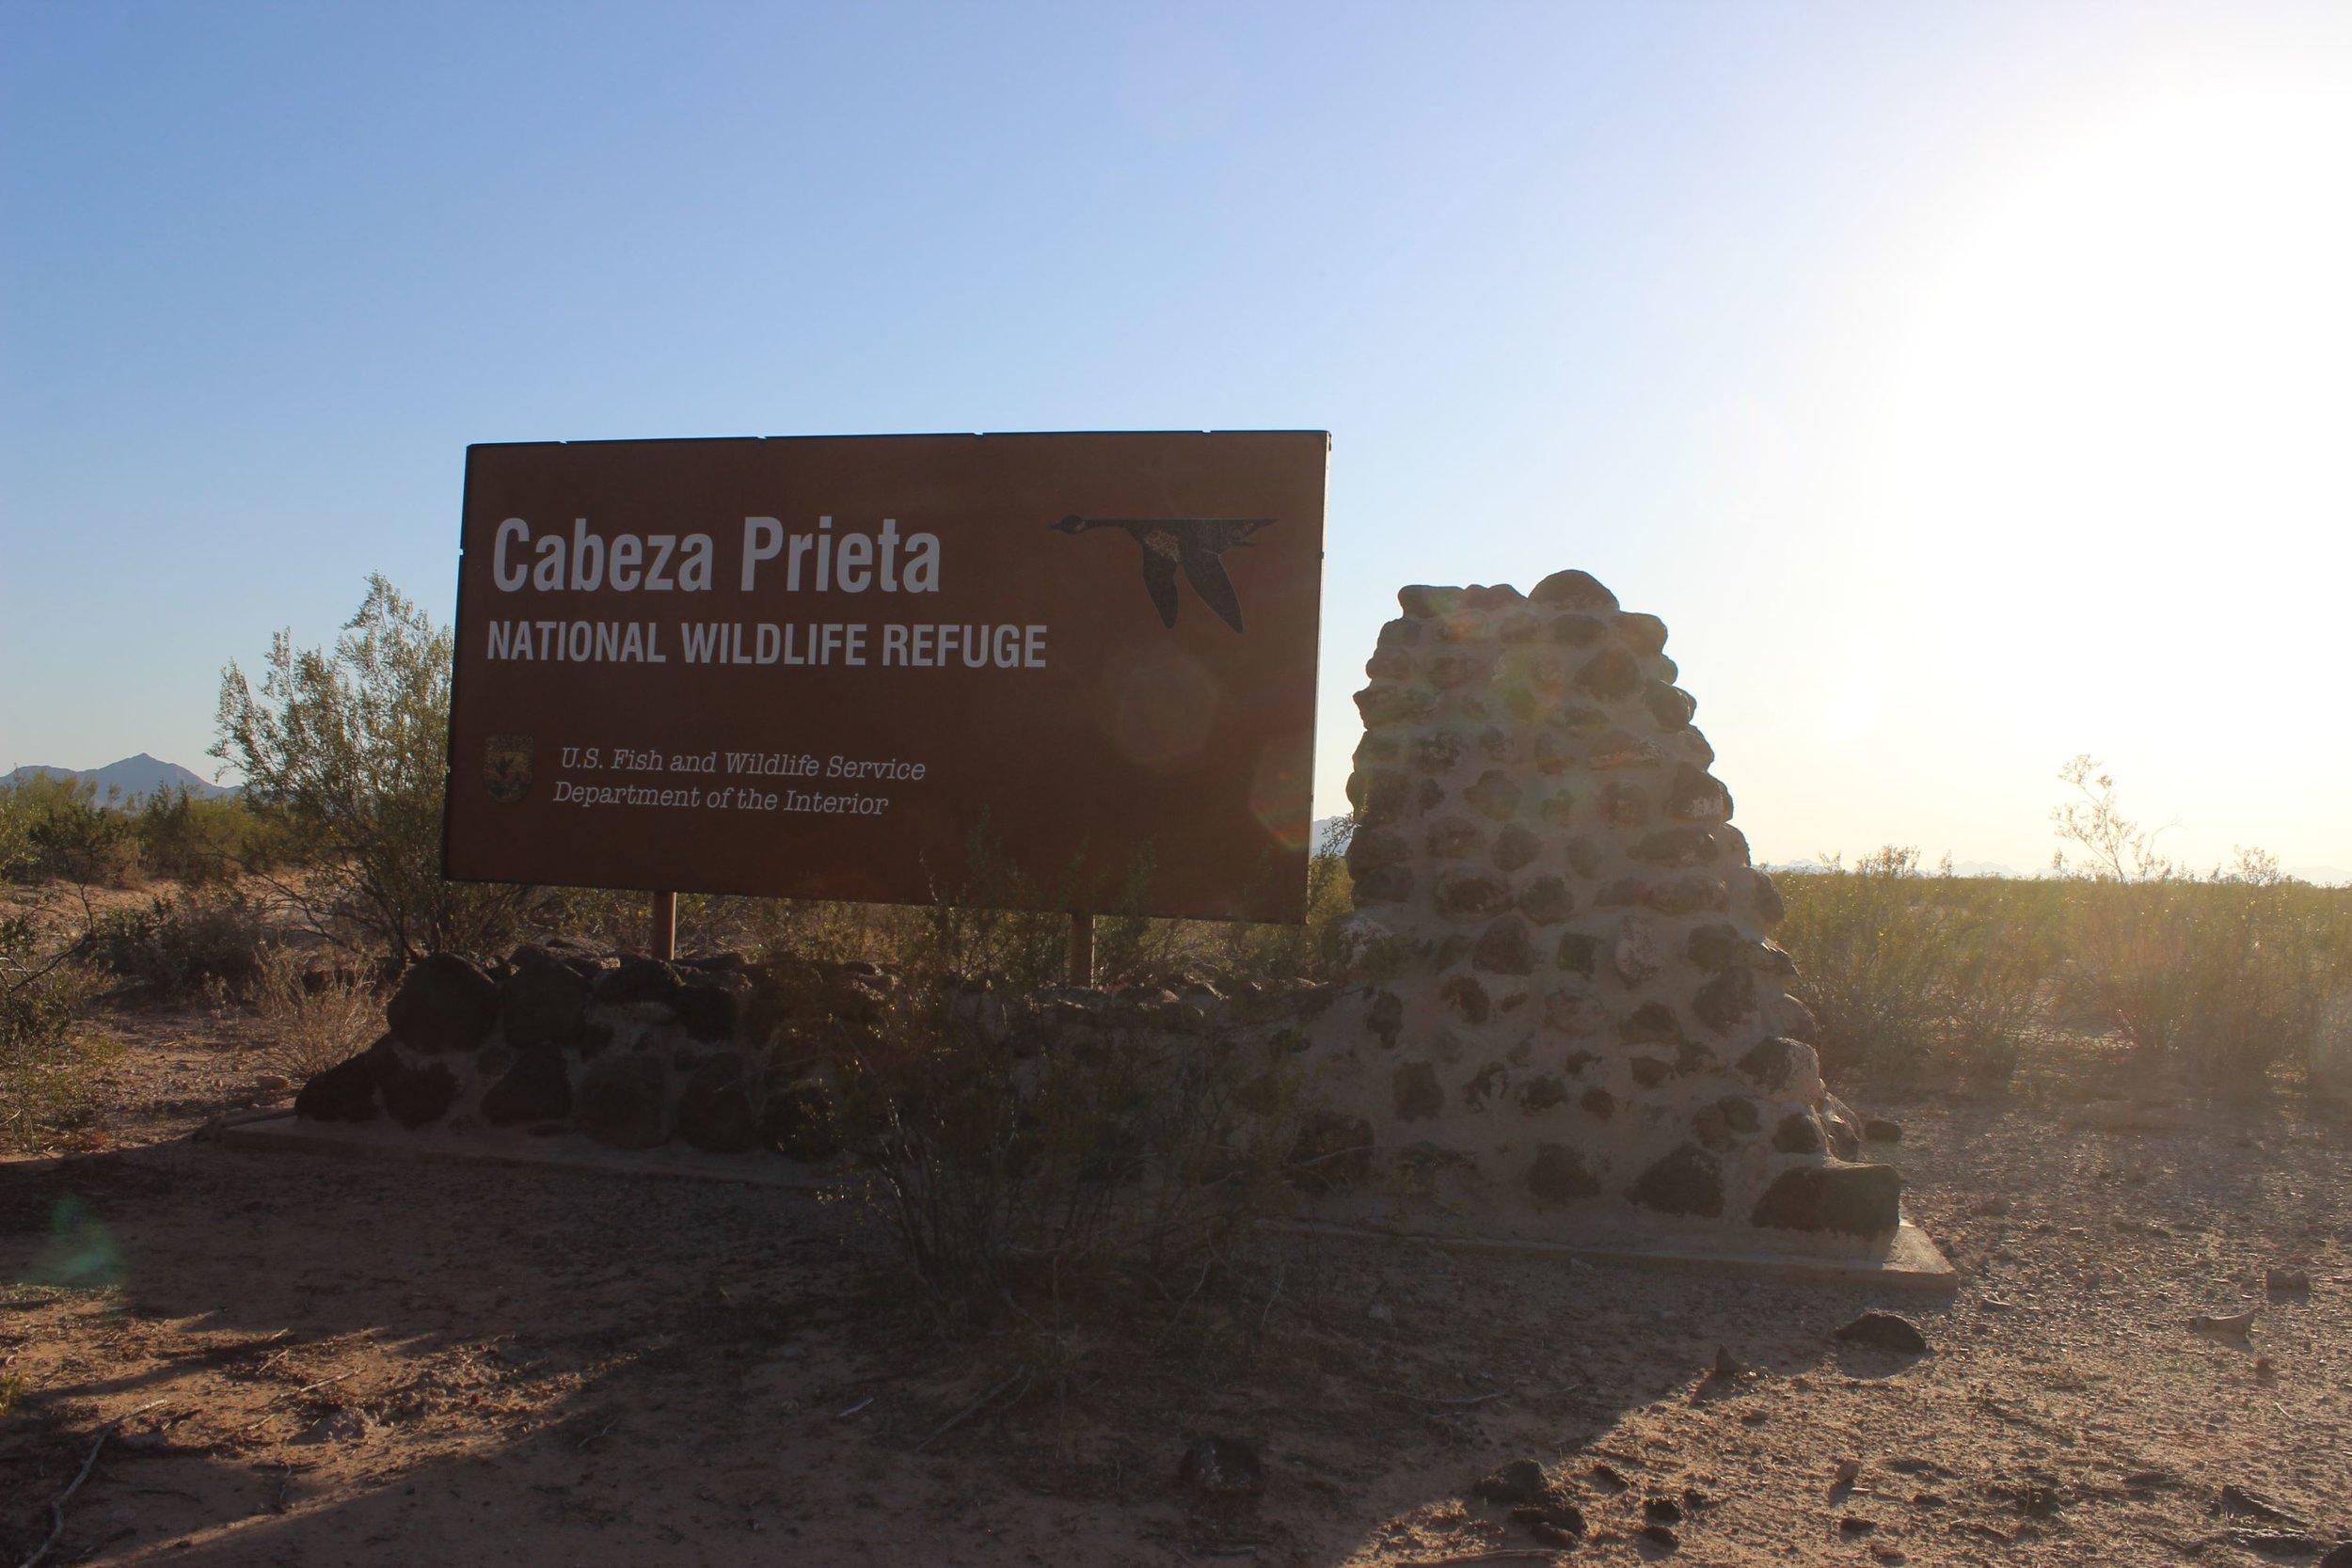 Crossing into Cabeza Prieta NWR.